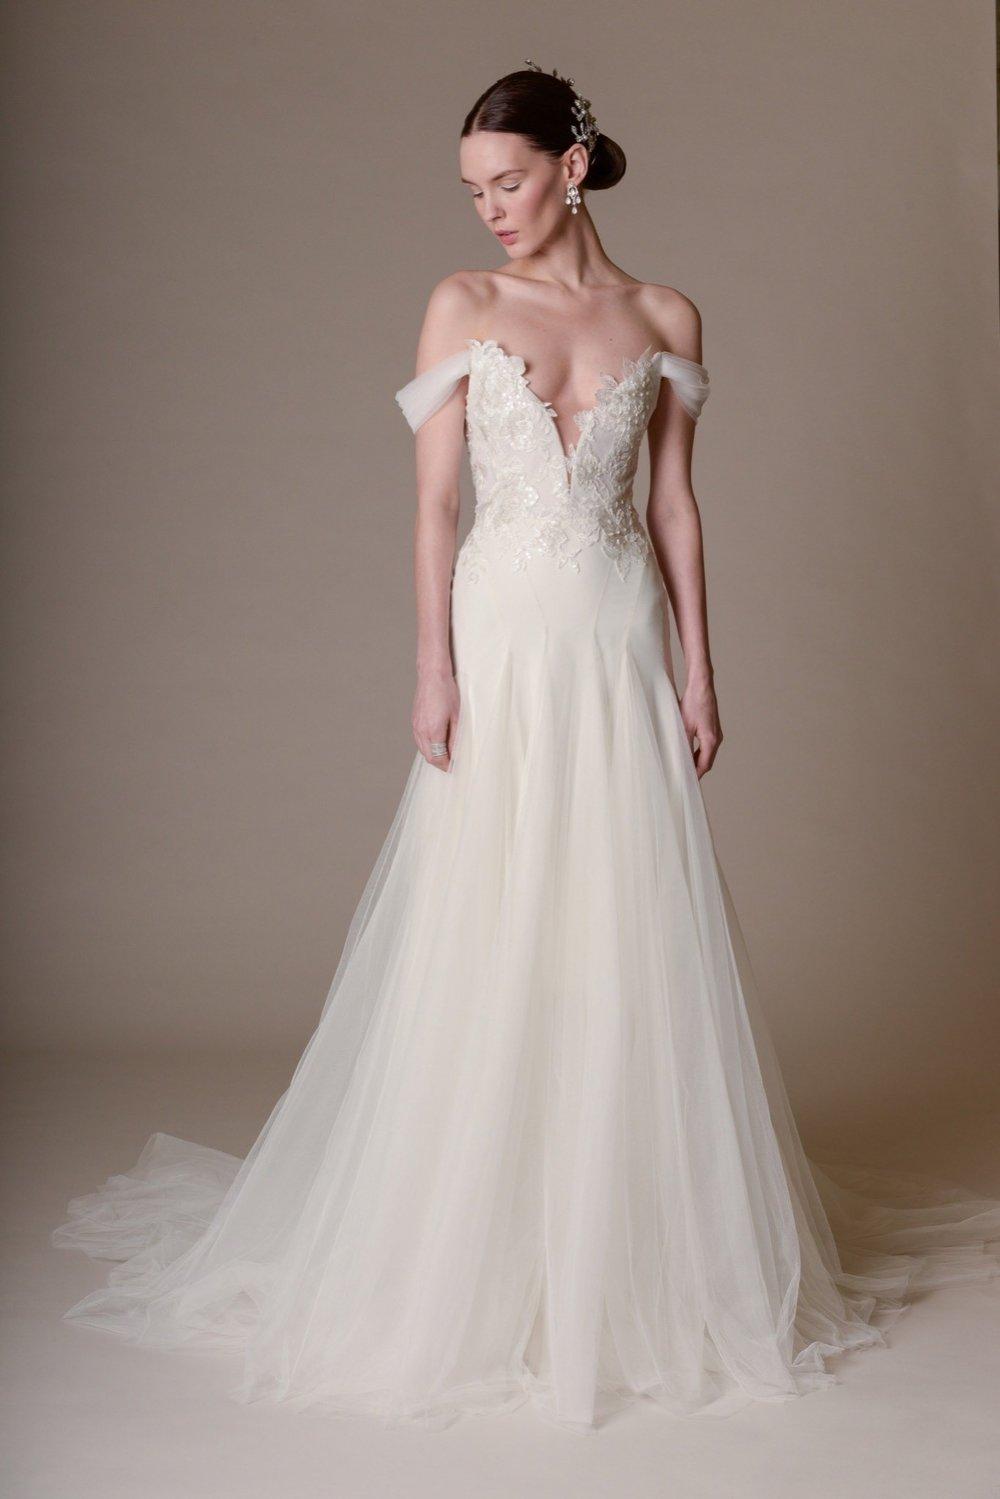 Season: Spring 2016    Gown name: Hyacinth 一字膊合身剪裁的婚紗    Description: 一字膊合身剪裁的婚紗,胸口及腰身飾有花絲線貼花的手工刺繡及鑲嵌了釘 珠細節。高質輕紗裙擺呈現浪漫的飄逸感。